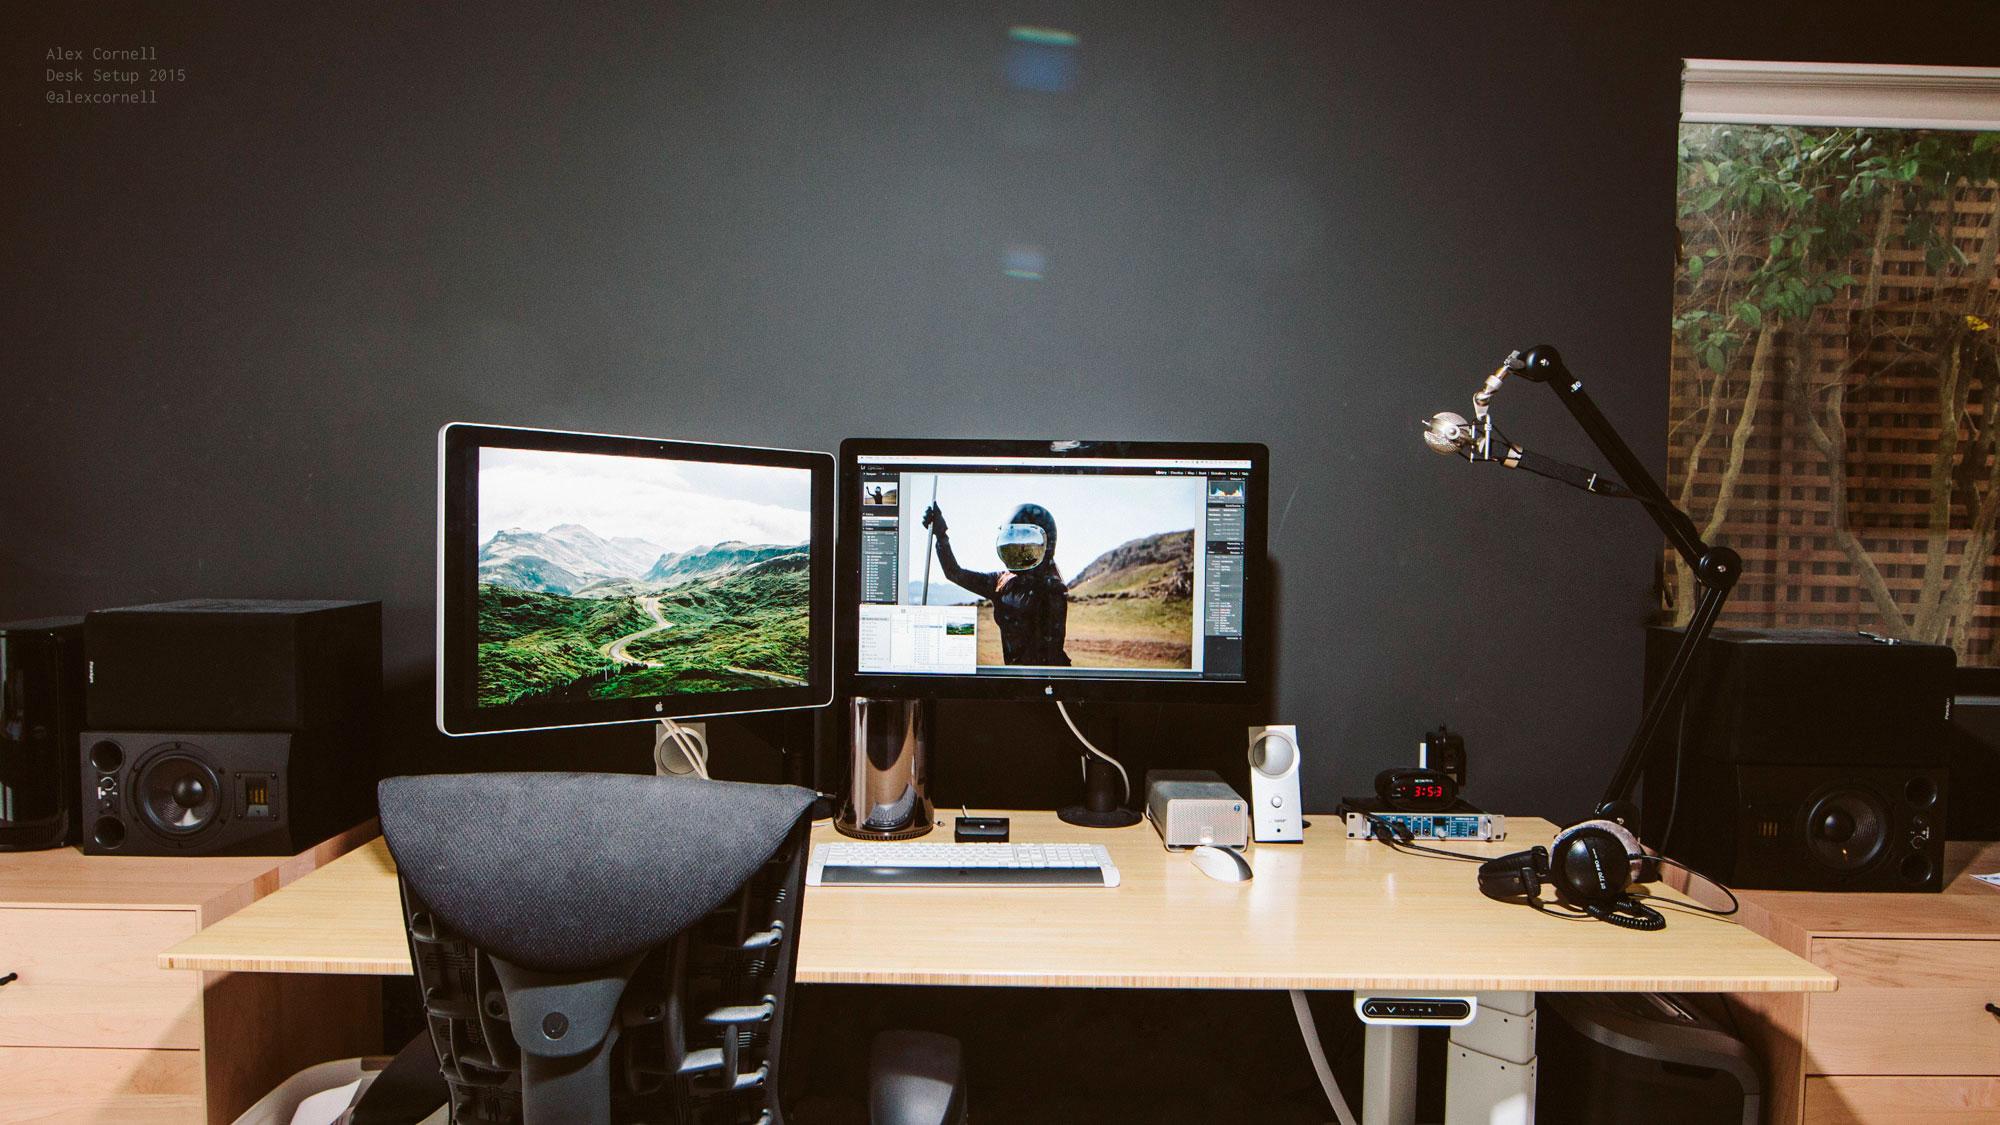 Working From Home My Desk Setup  Alex Cornell  Alex